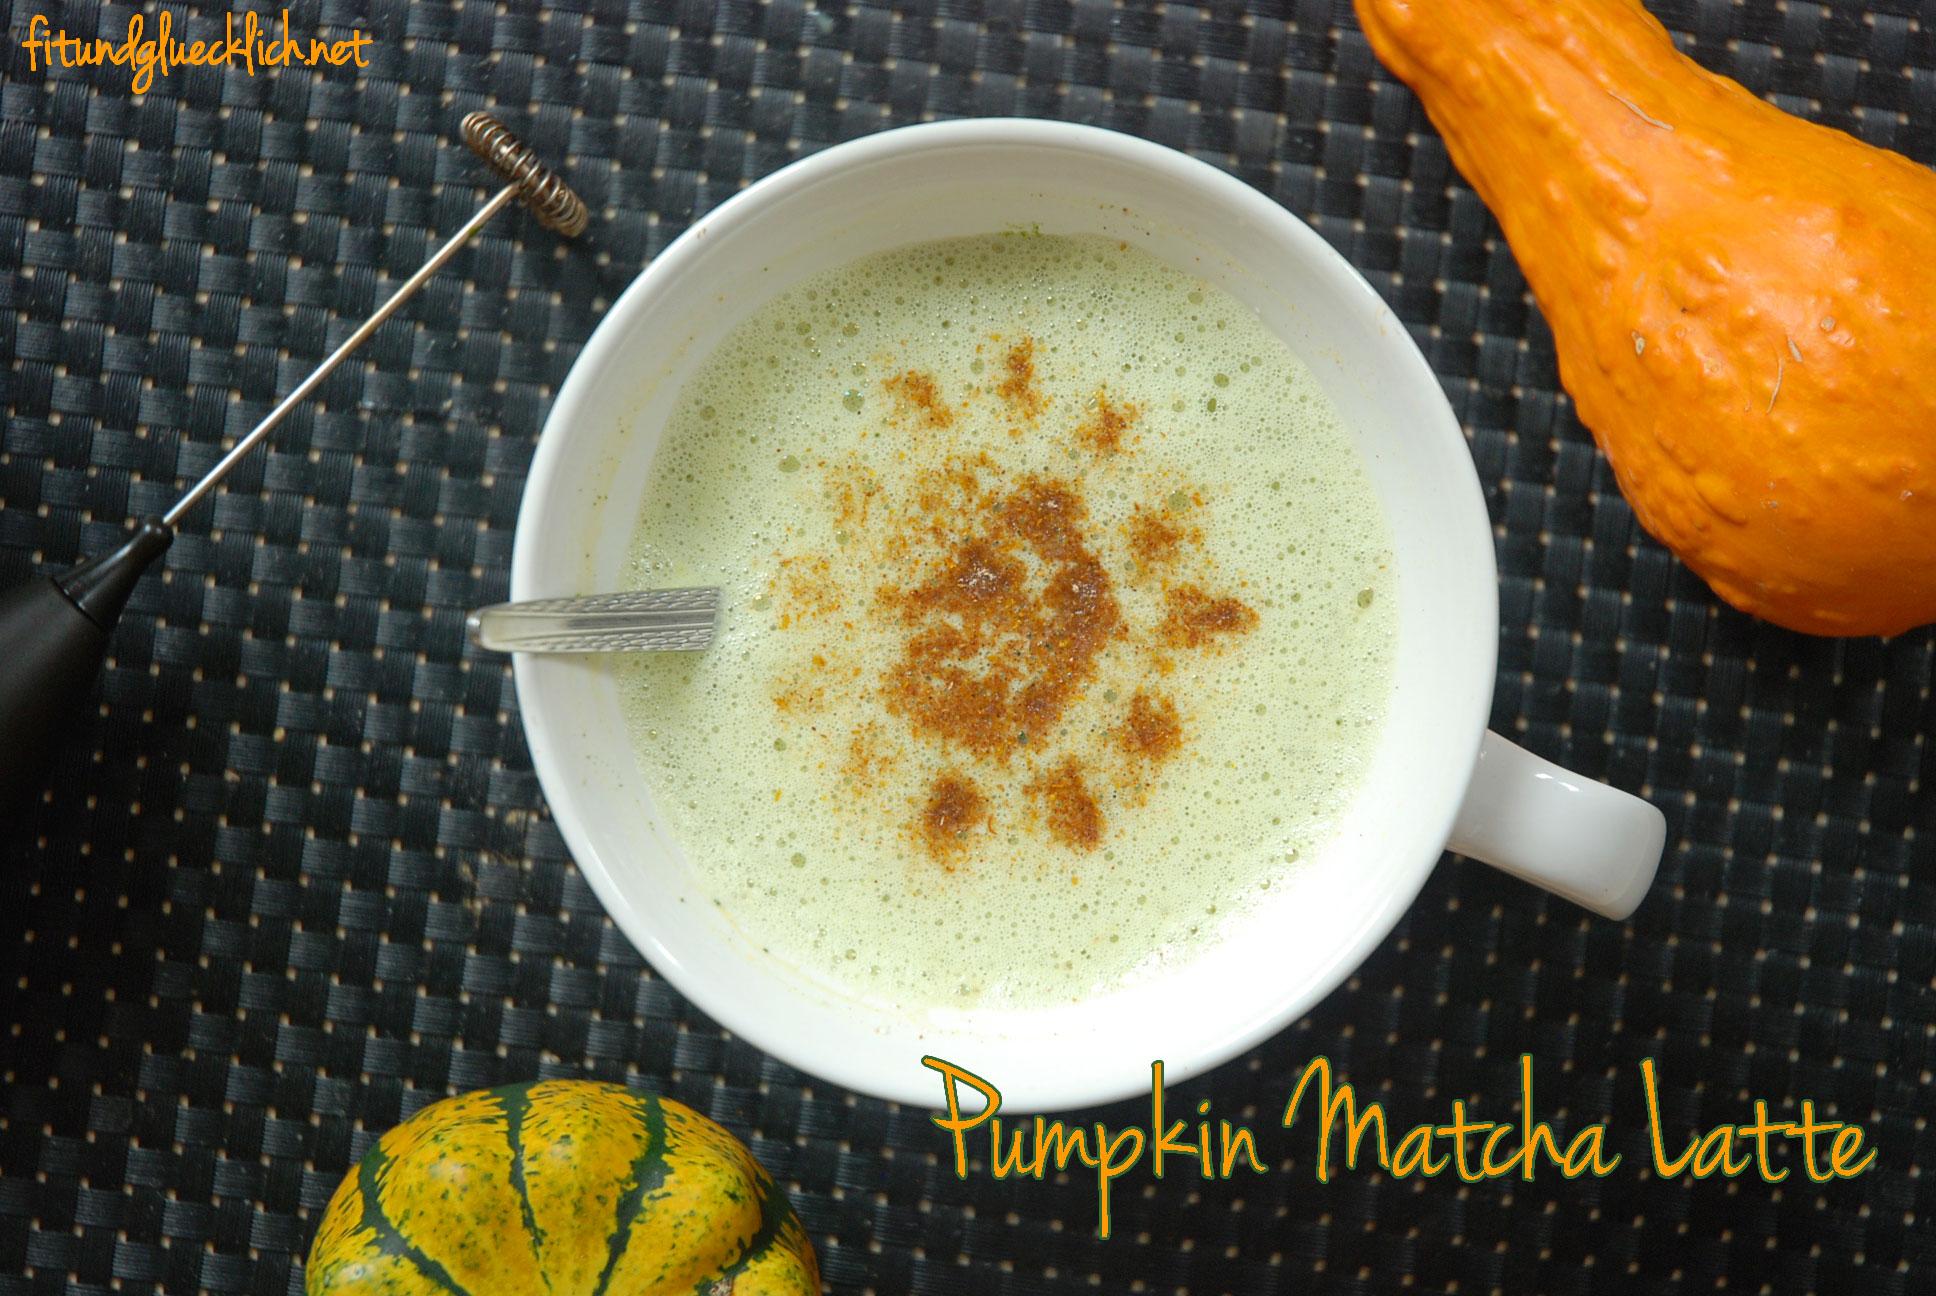 Kürbis-Matcha-Latte / Pumpkin Matcha Latte